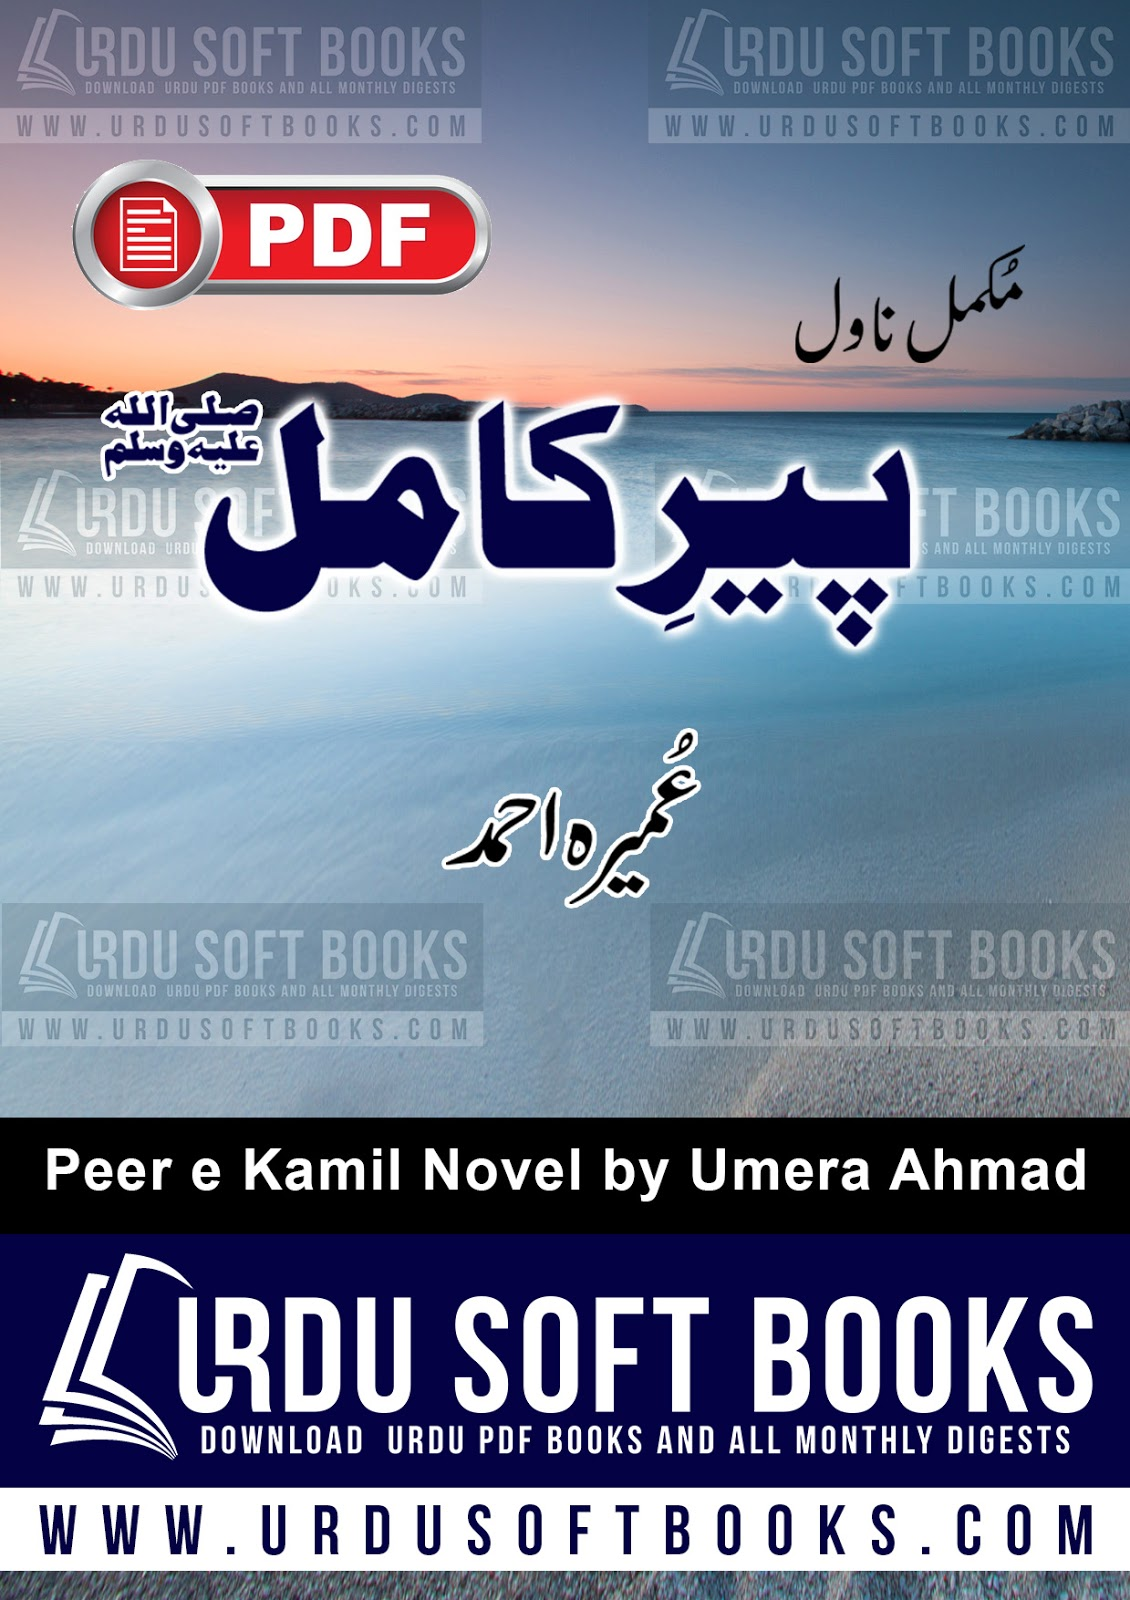 Peer E Kamil By Umaira Ahmad Pdf